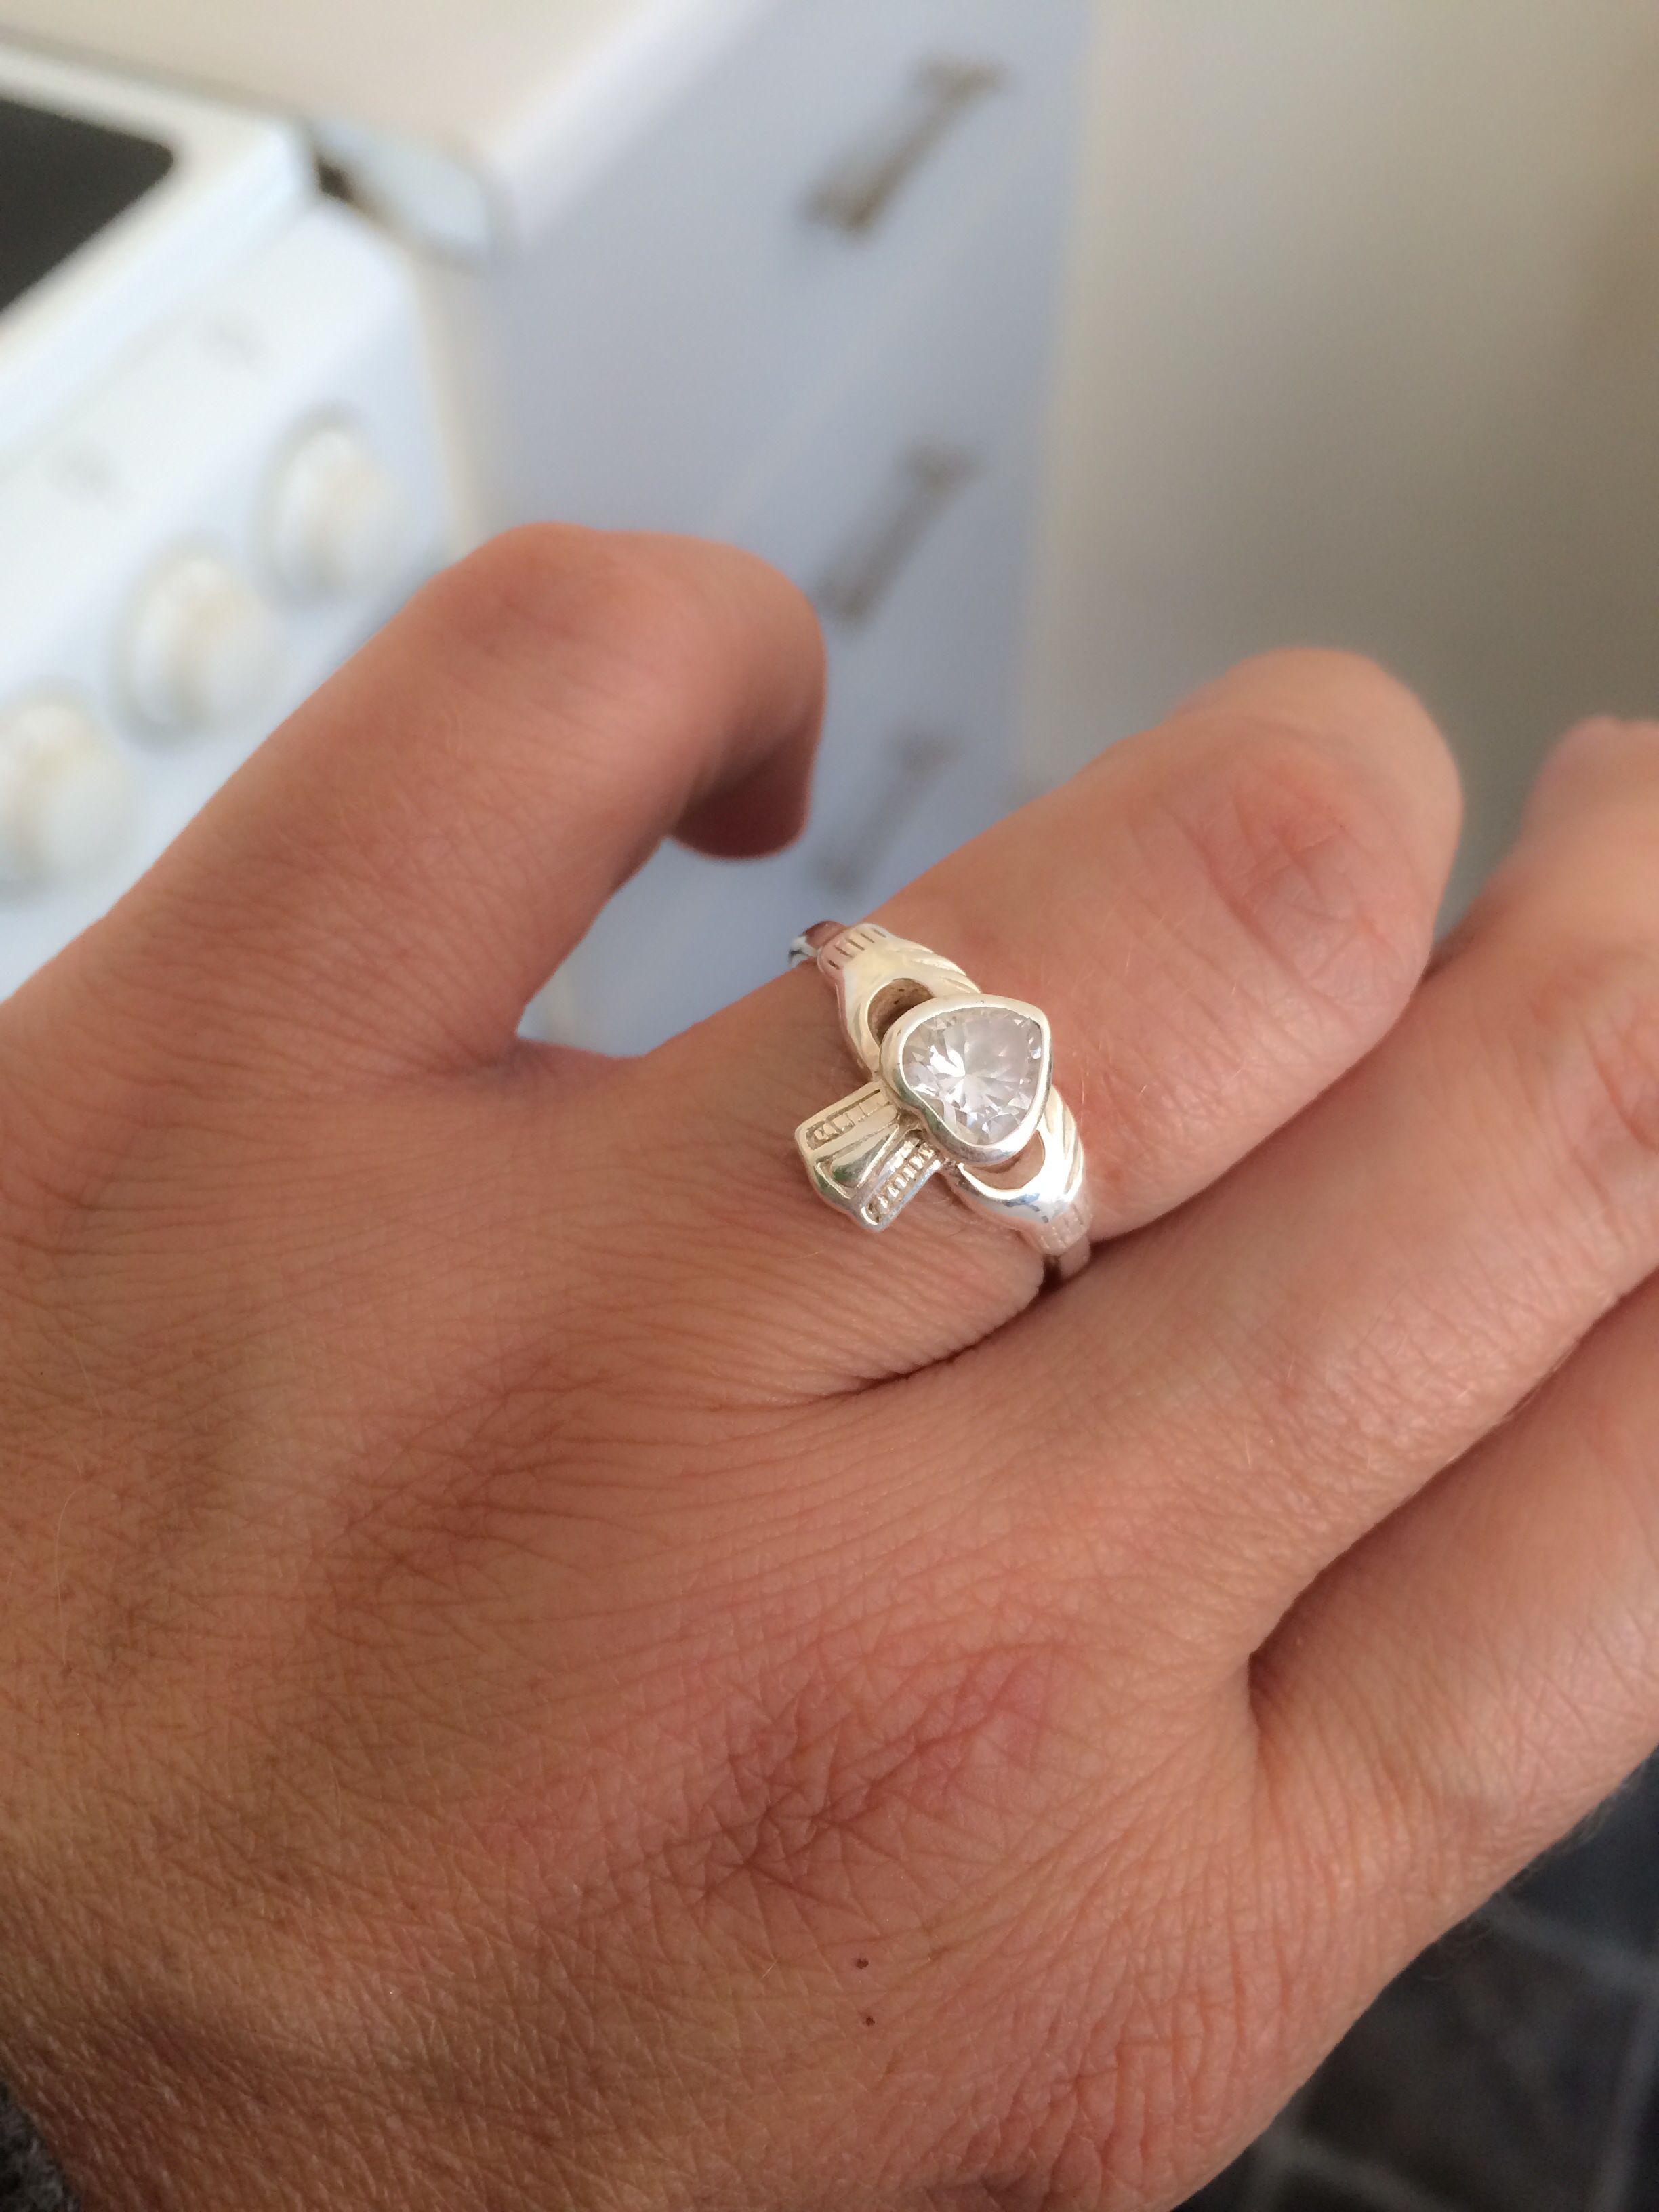 My diamond Claddagh engagement ring from my sweet Irish fianc